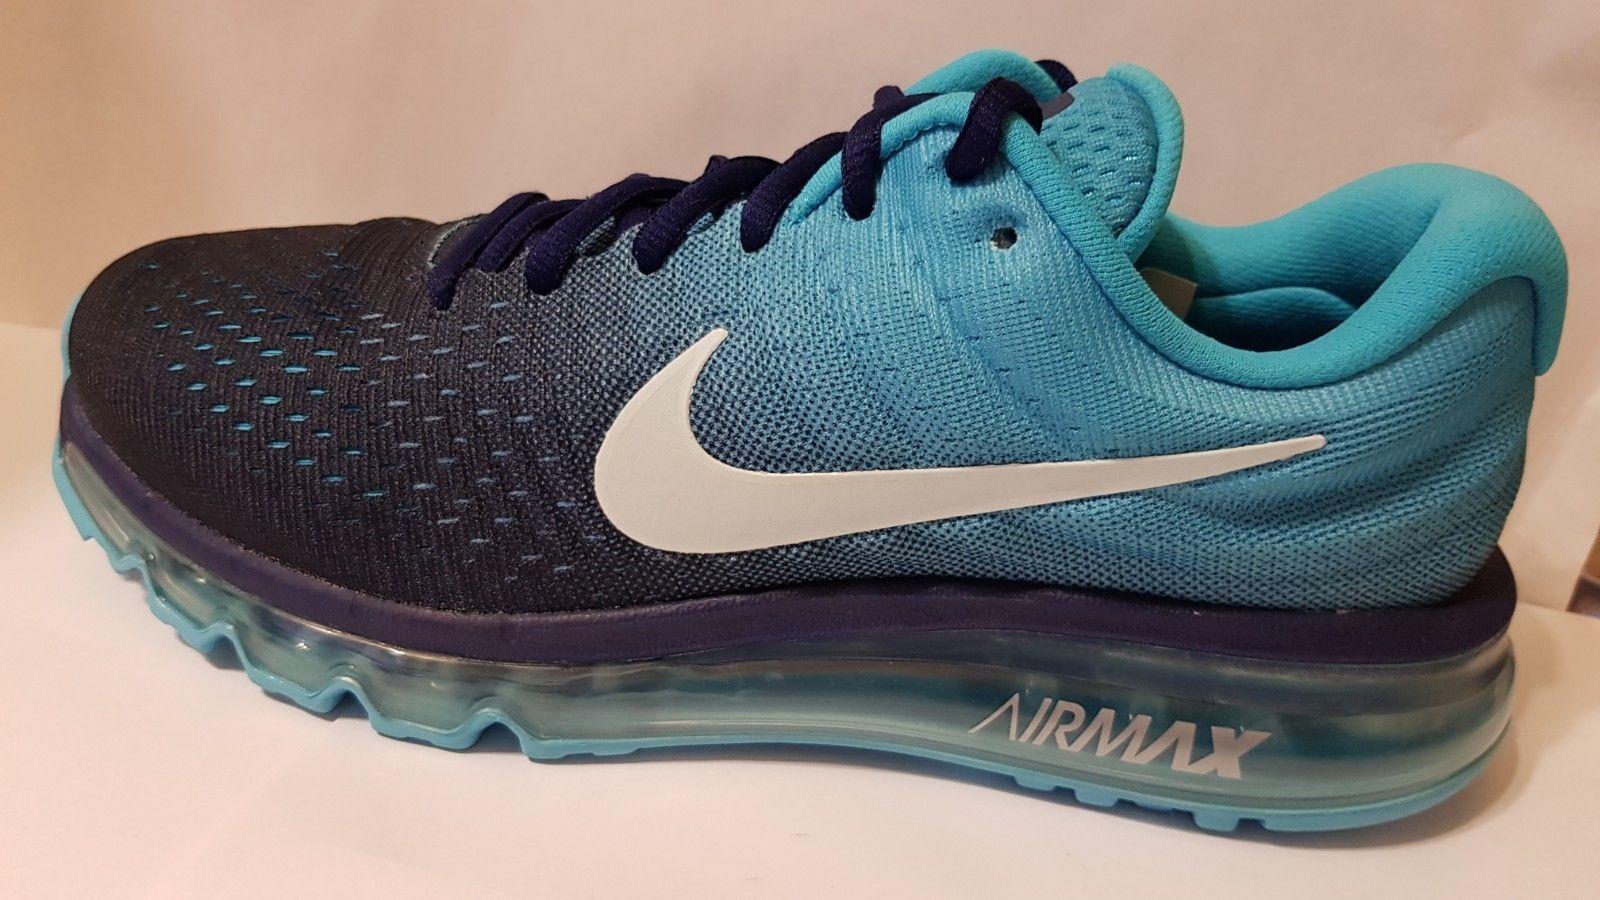 best service 74757 eba61 Nike Nike Nike Air Max 2017 Basse Course Athlétisme Chaussure Baskets  849559 404 Sz 8.5 b7d37e